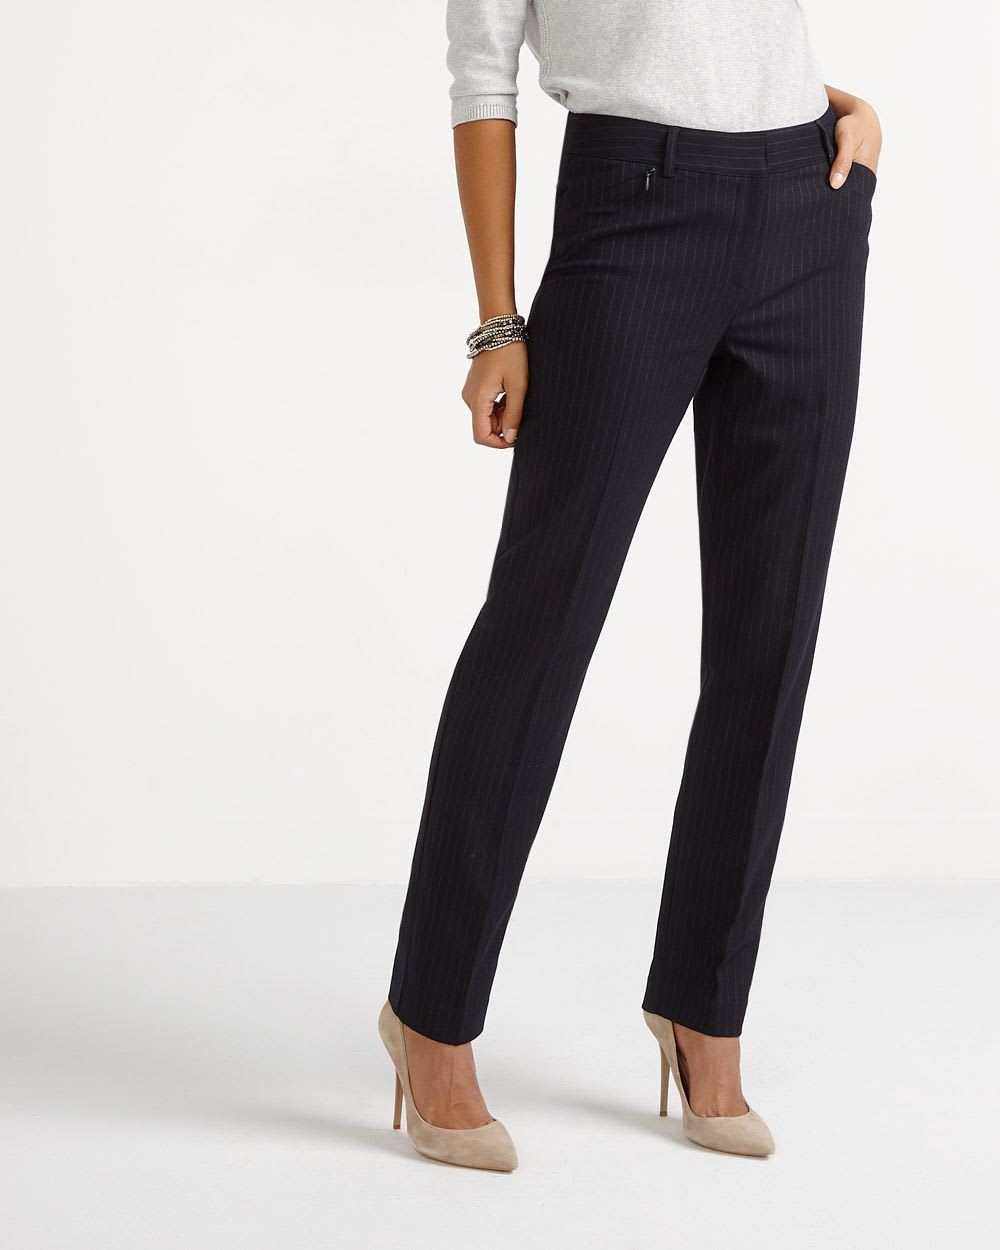 The New Classic Straight Leg Pinstripe Pants